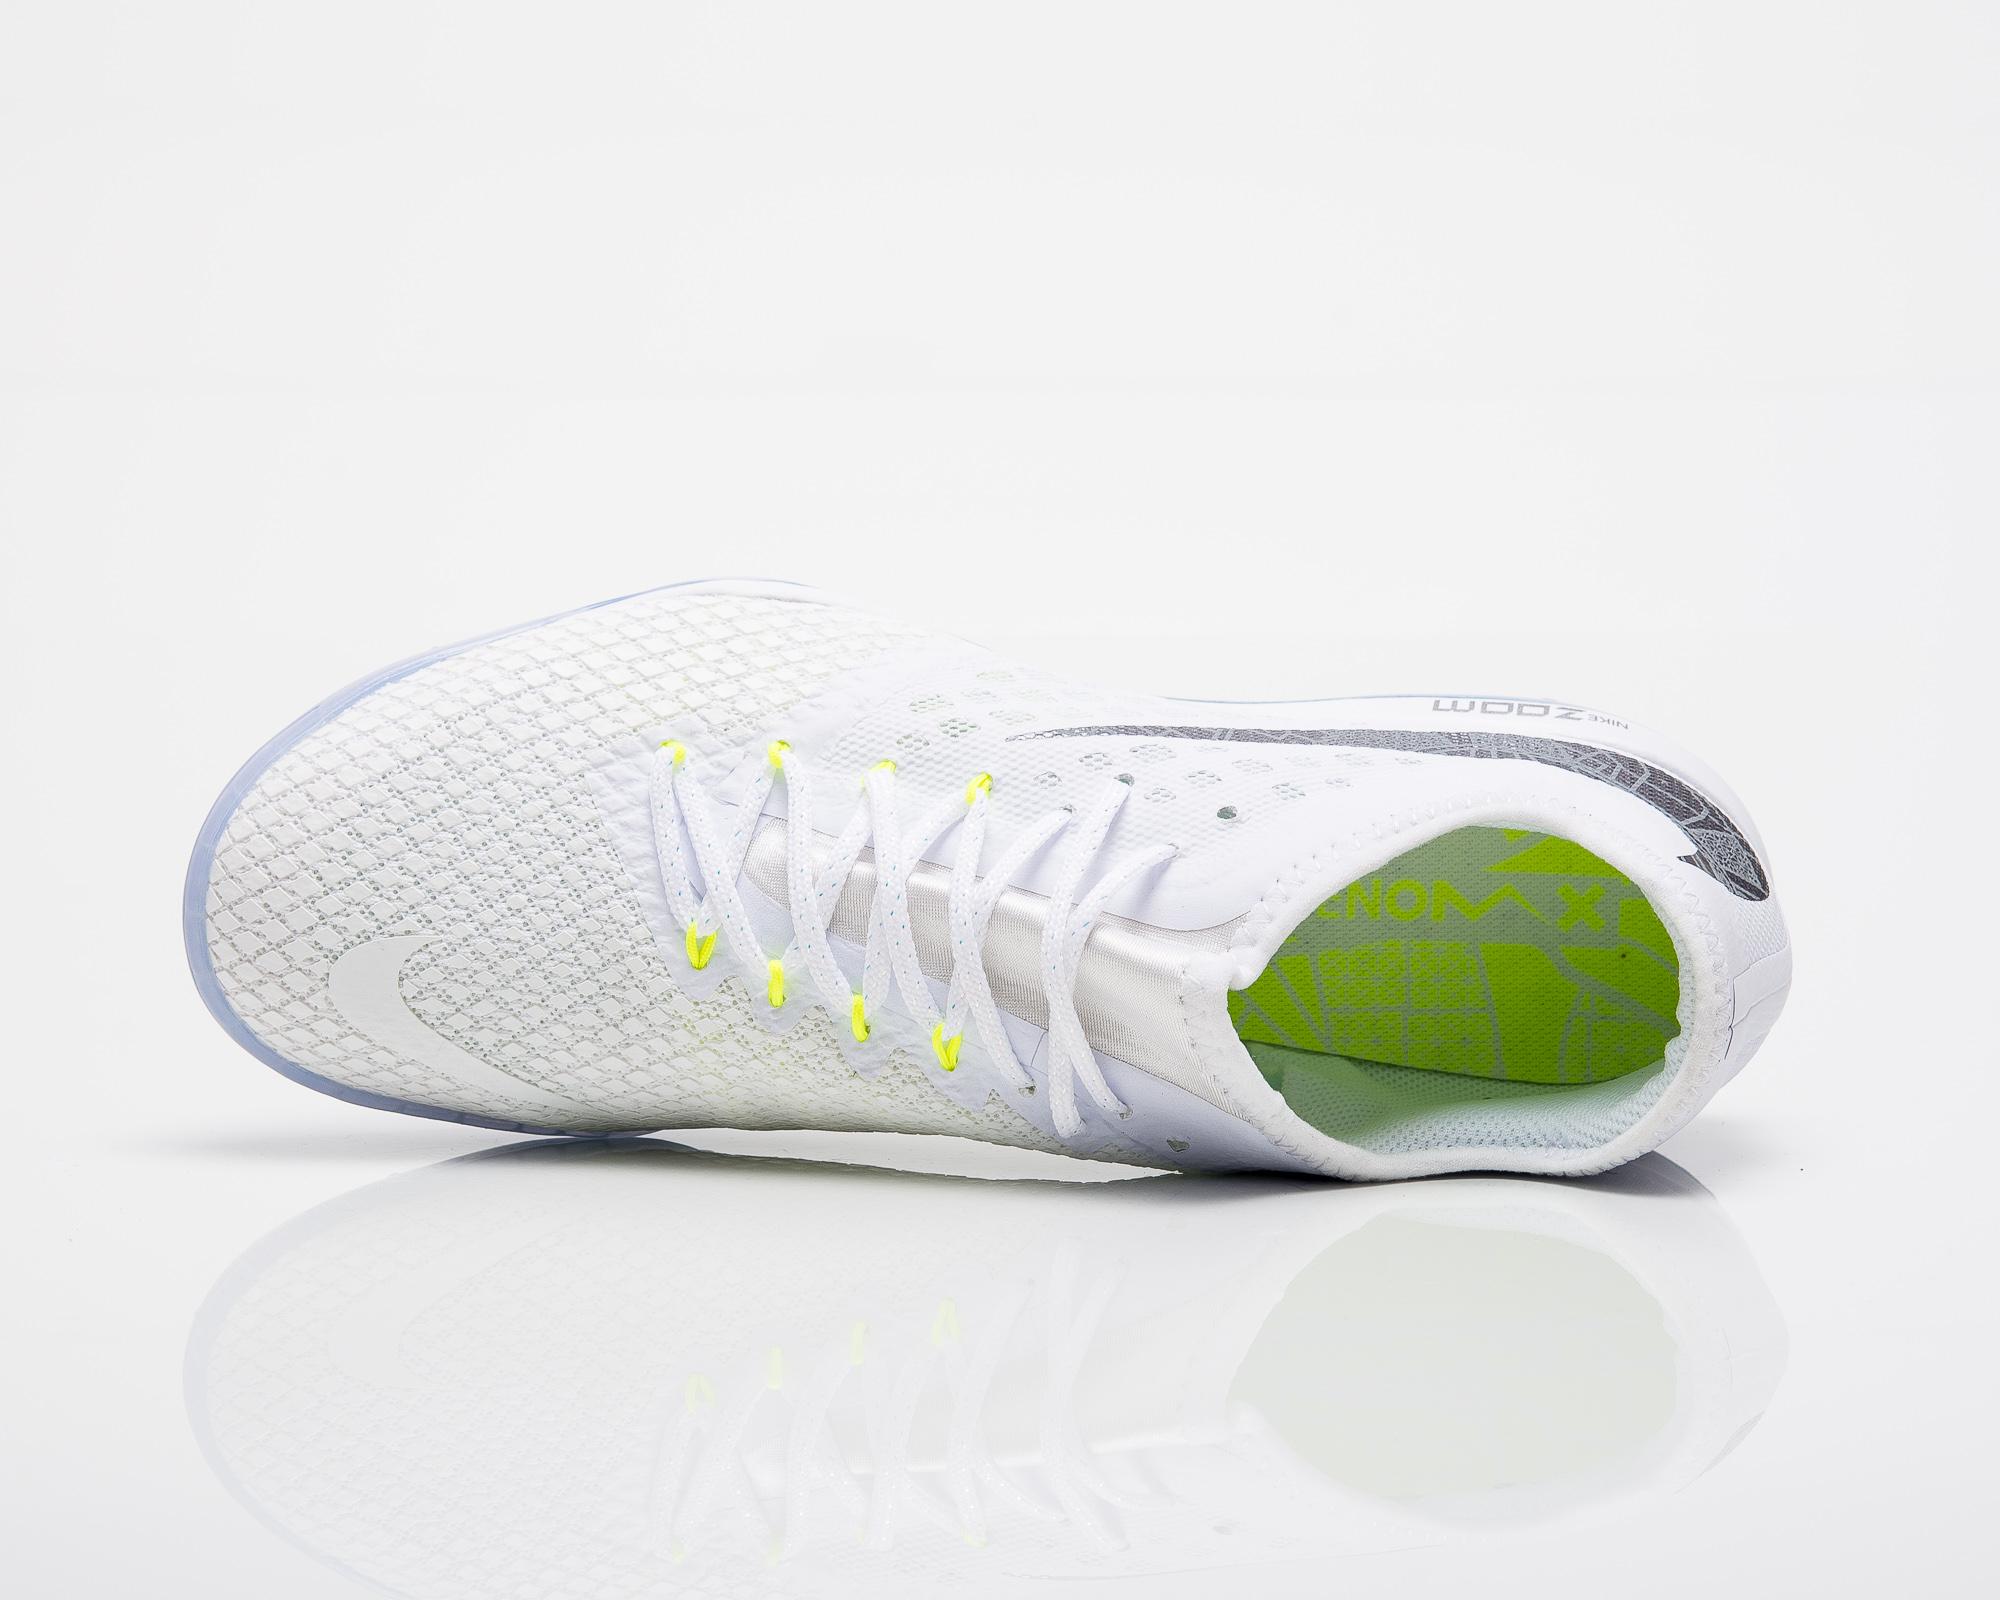 60ca458fc32 Nike Hypervenom Zoom PhantomX III Pro TF - Shoes Soccer - Sporting ...